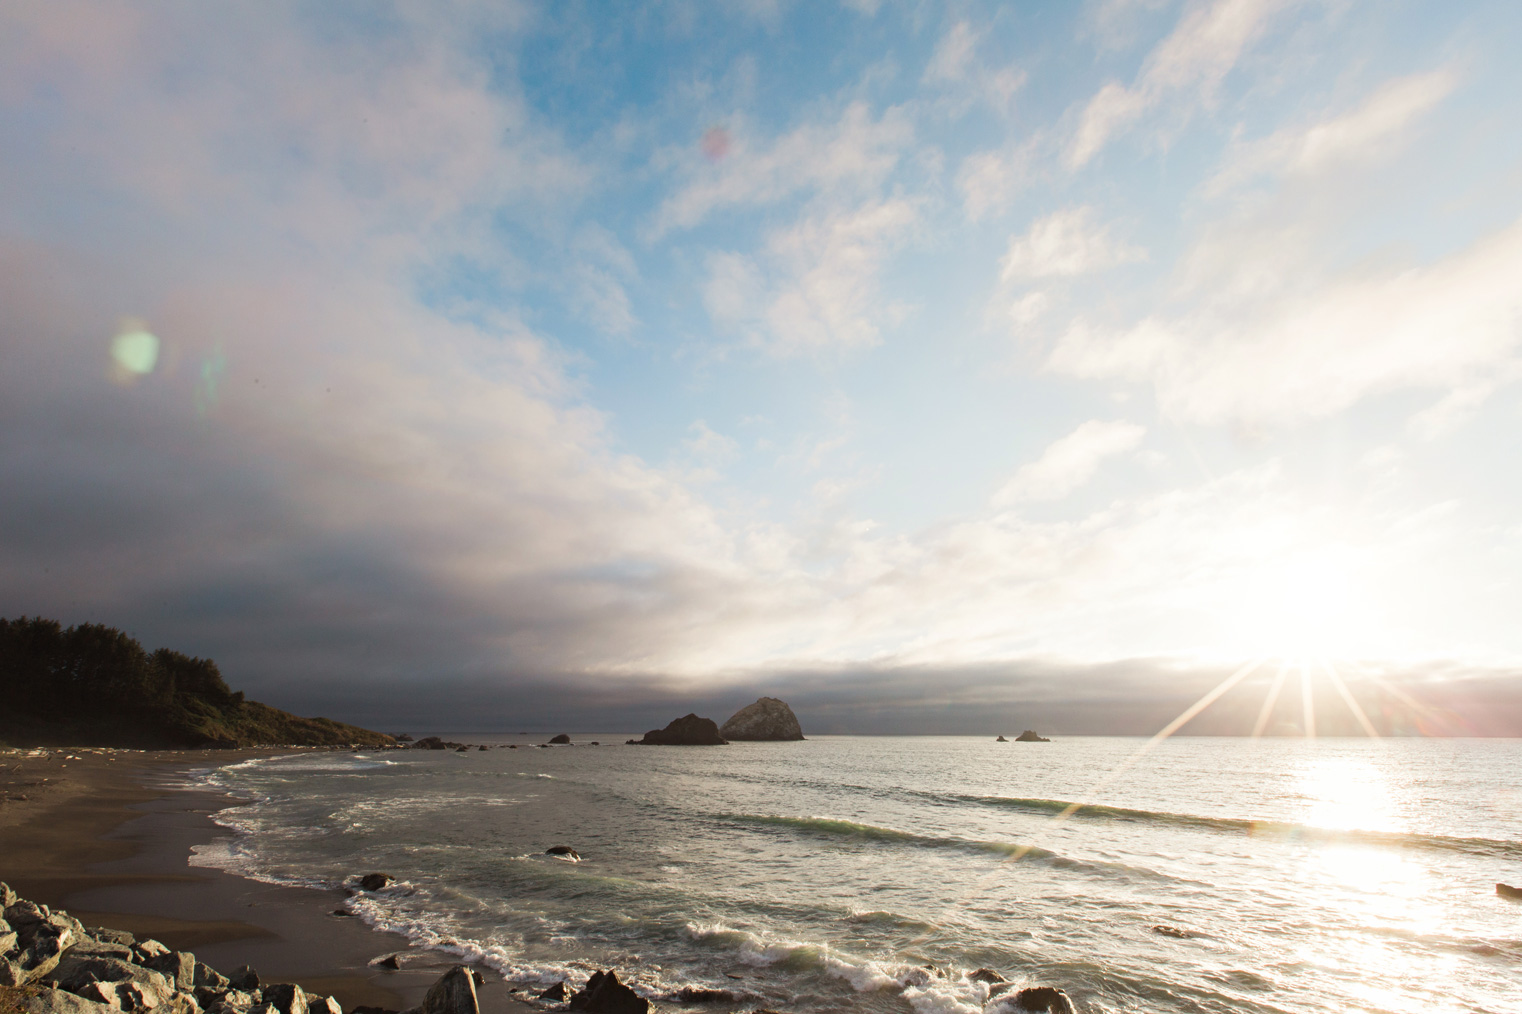 CindyGiovagnoli_Crater_Lake_National_Park_Cape_Perpetua_Heceta_Head_lighthouse_Pacific_Ocean_Cannon_Beach_haystack_Oregon_coast-011.jpg